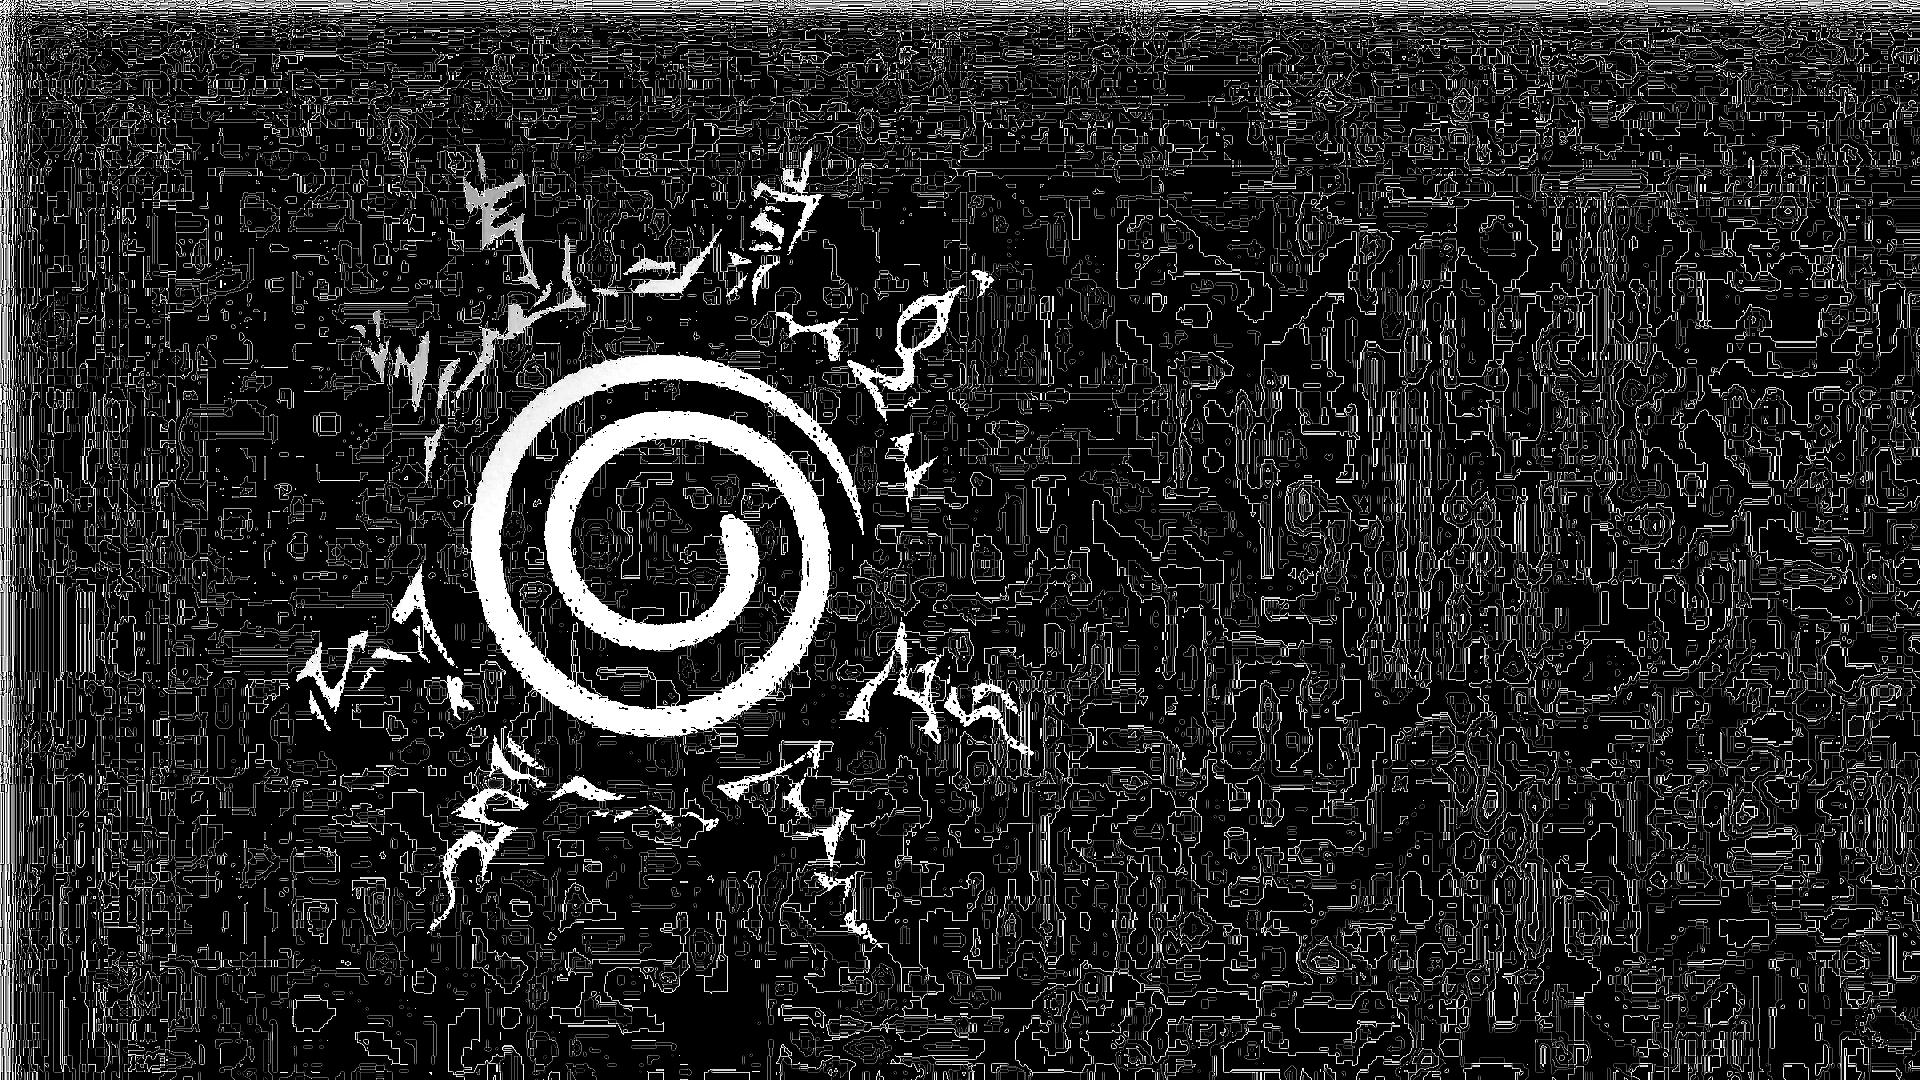 Naruto Hd Wallpaper Hintergrund 1920x1080 Id1010991